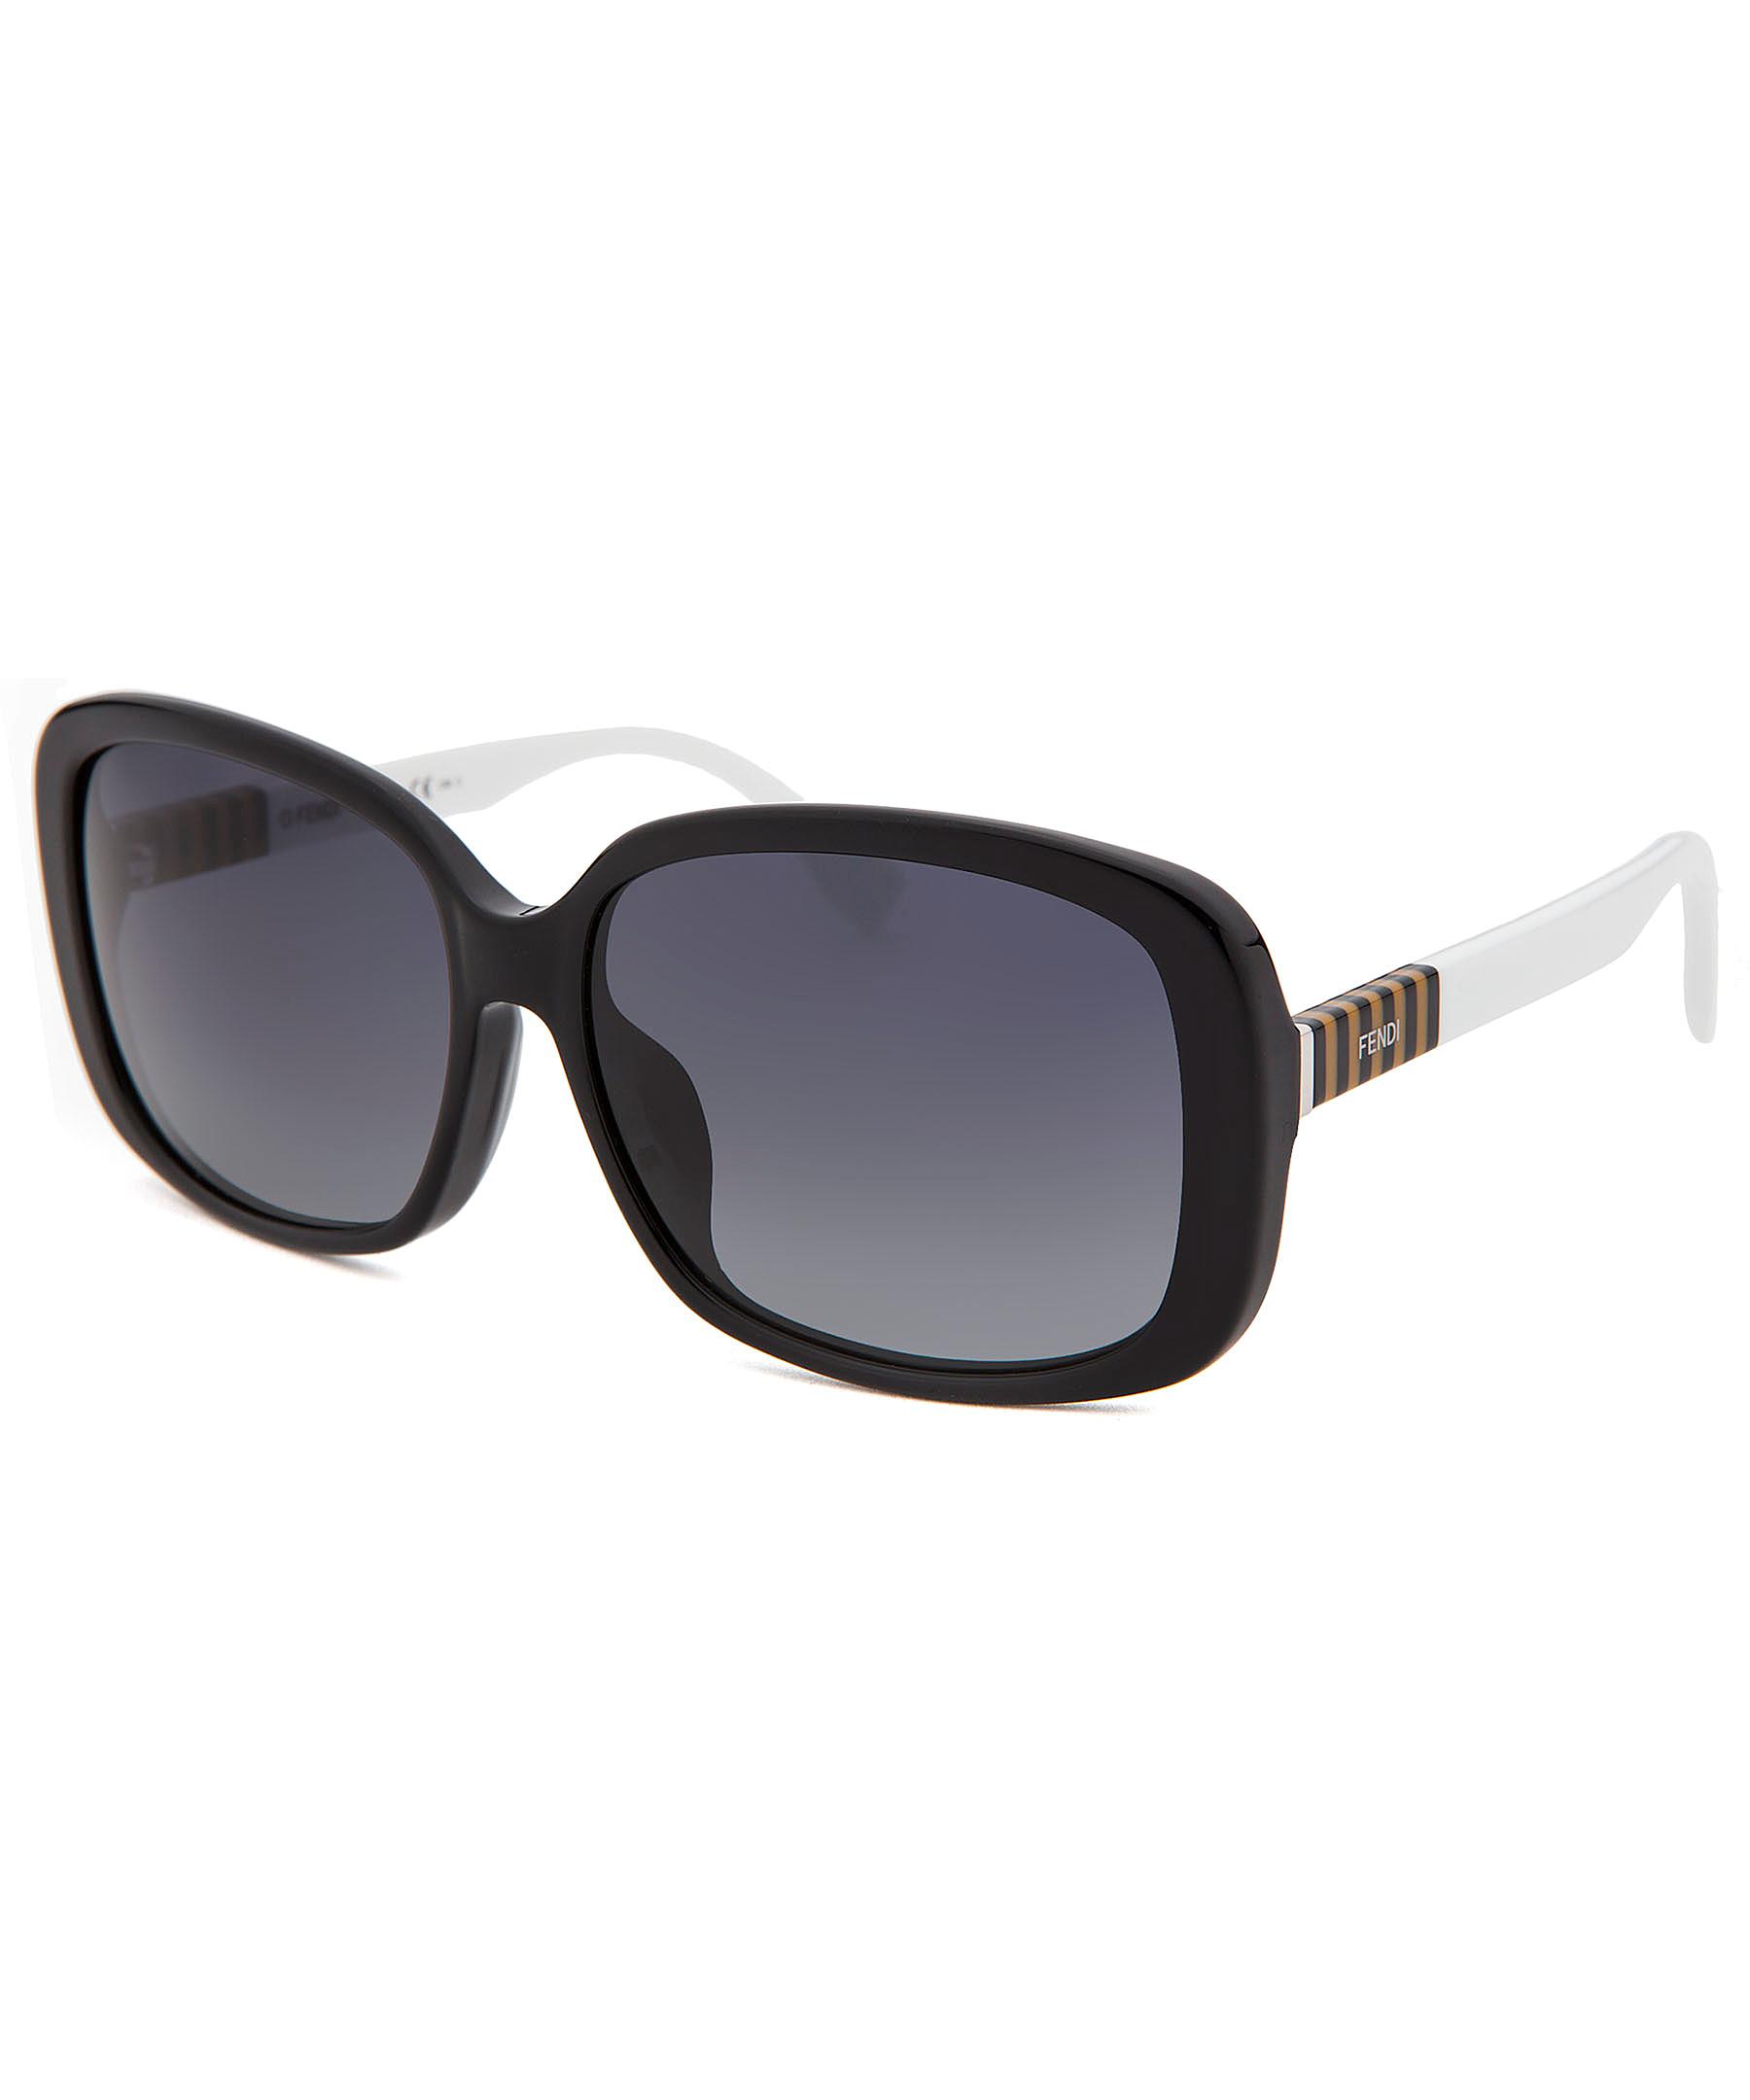 Fendi Women's Oversized Black Sunglasses White Arms in ...